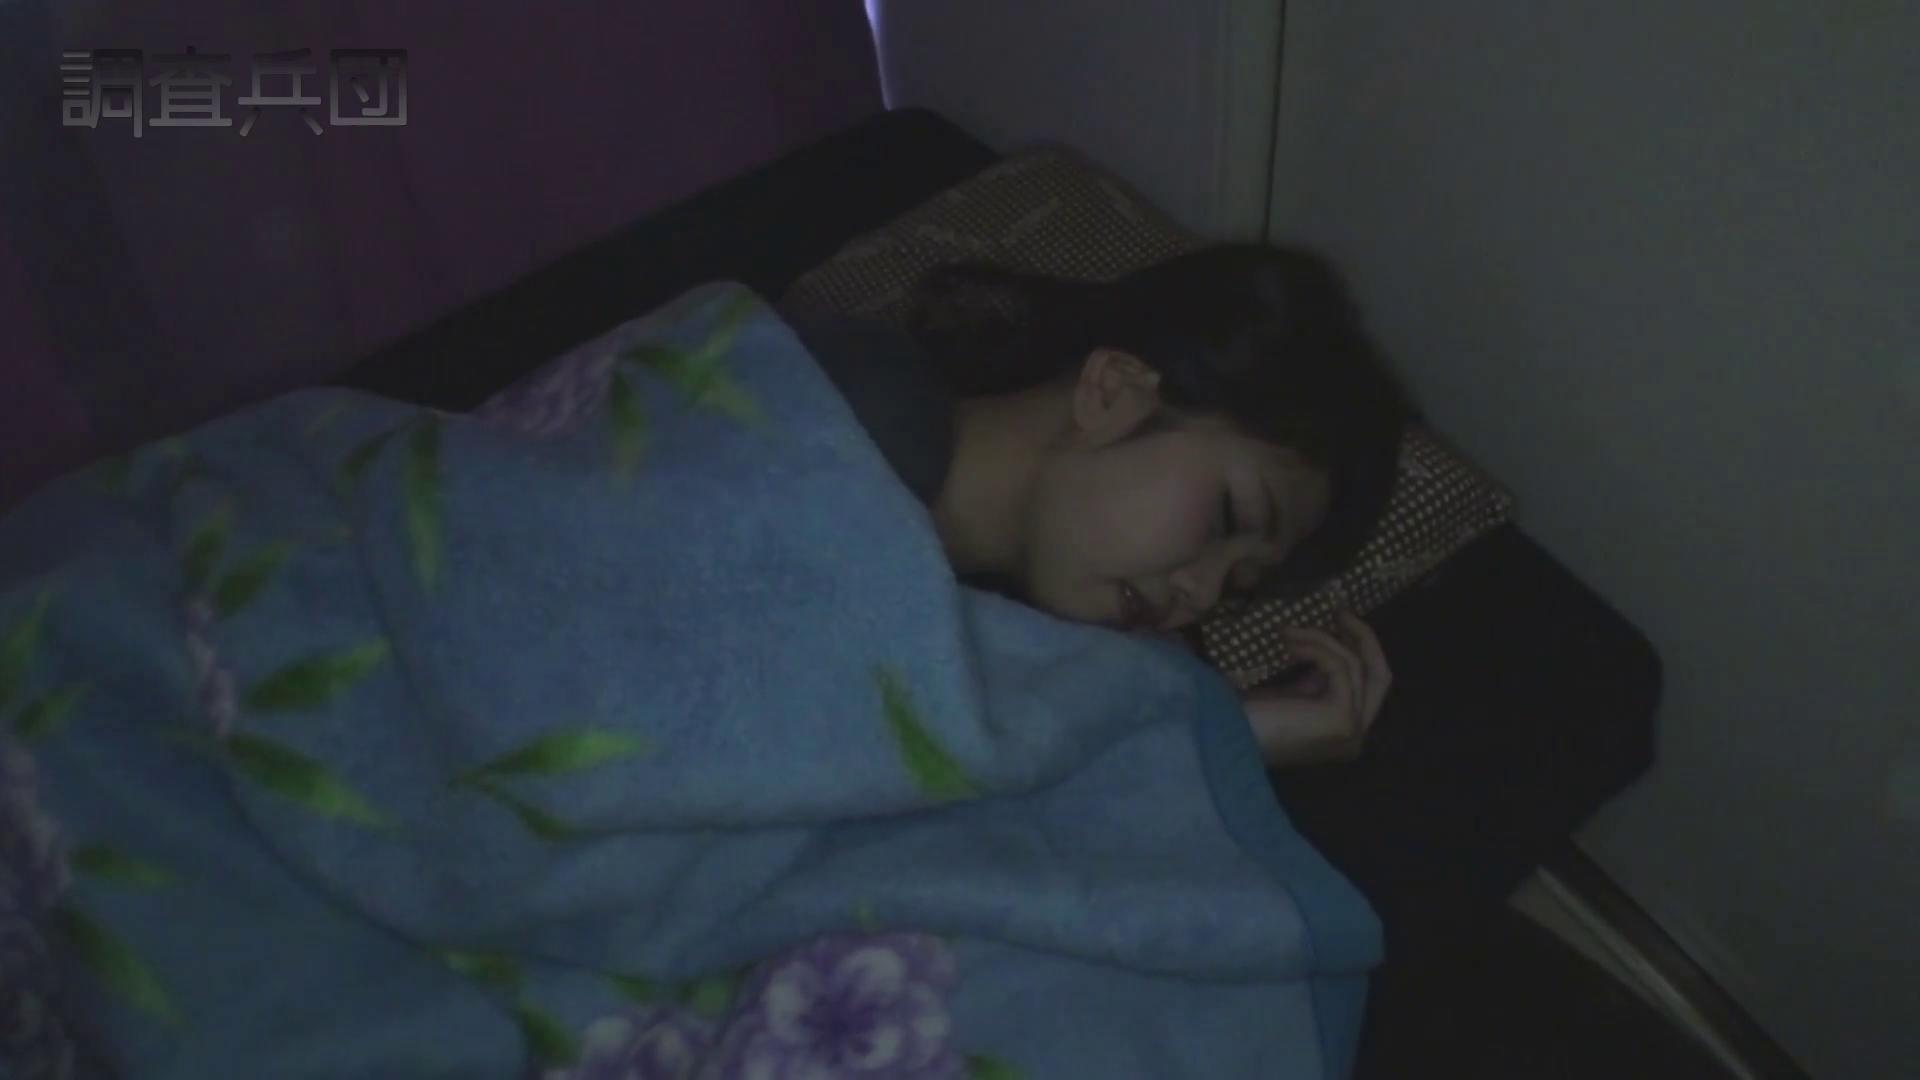 RE:~反撃の悪戯~vol.7 パンケーキ屋バイト・あかり【前編】 丸見え  101枚 6